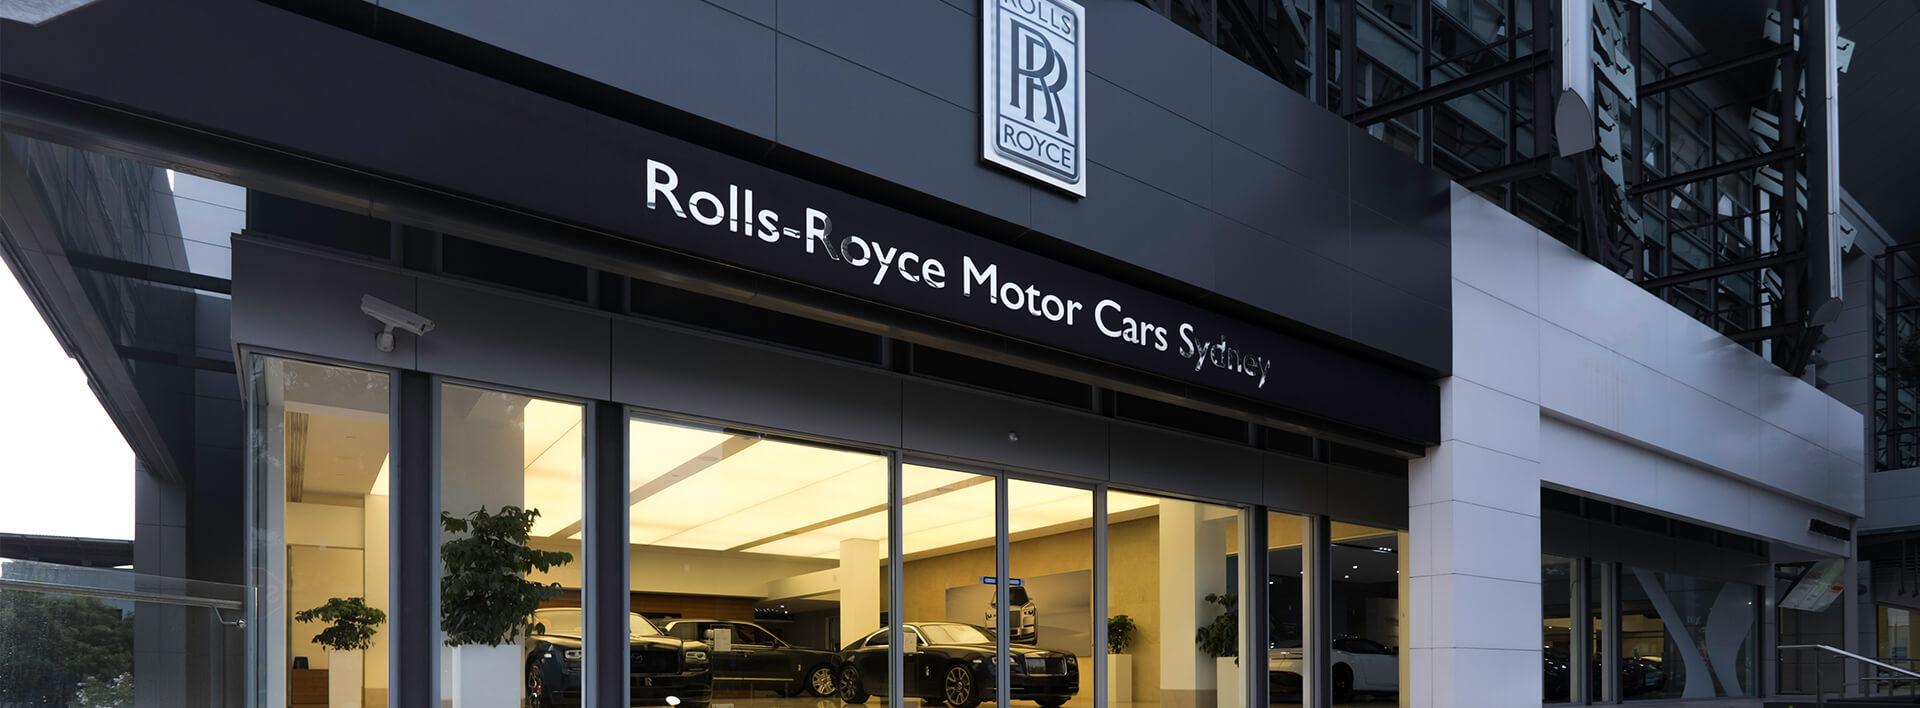 Rolls-Royce Motor Cars Sydney